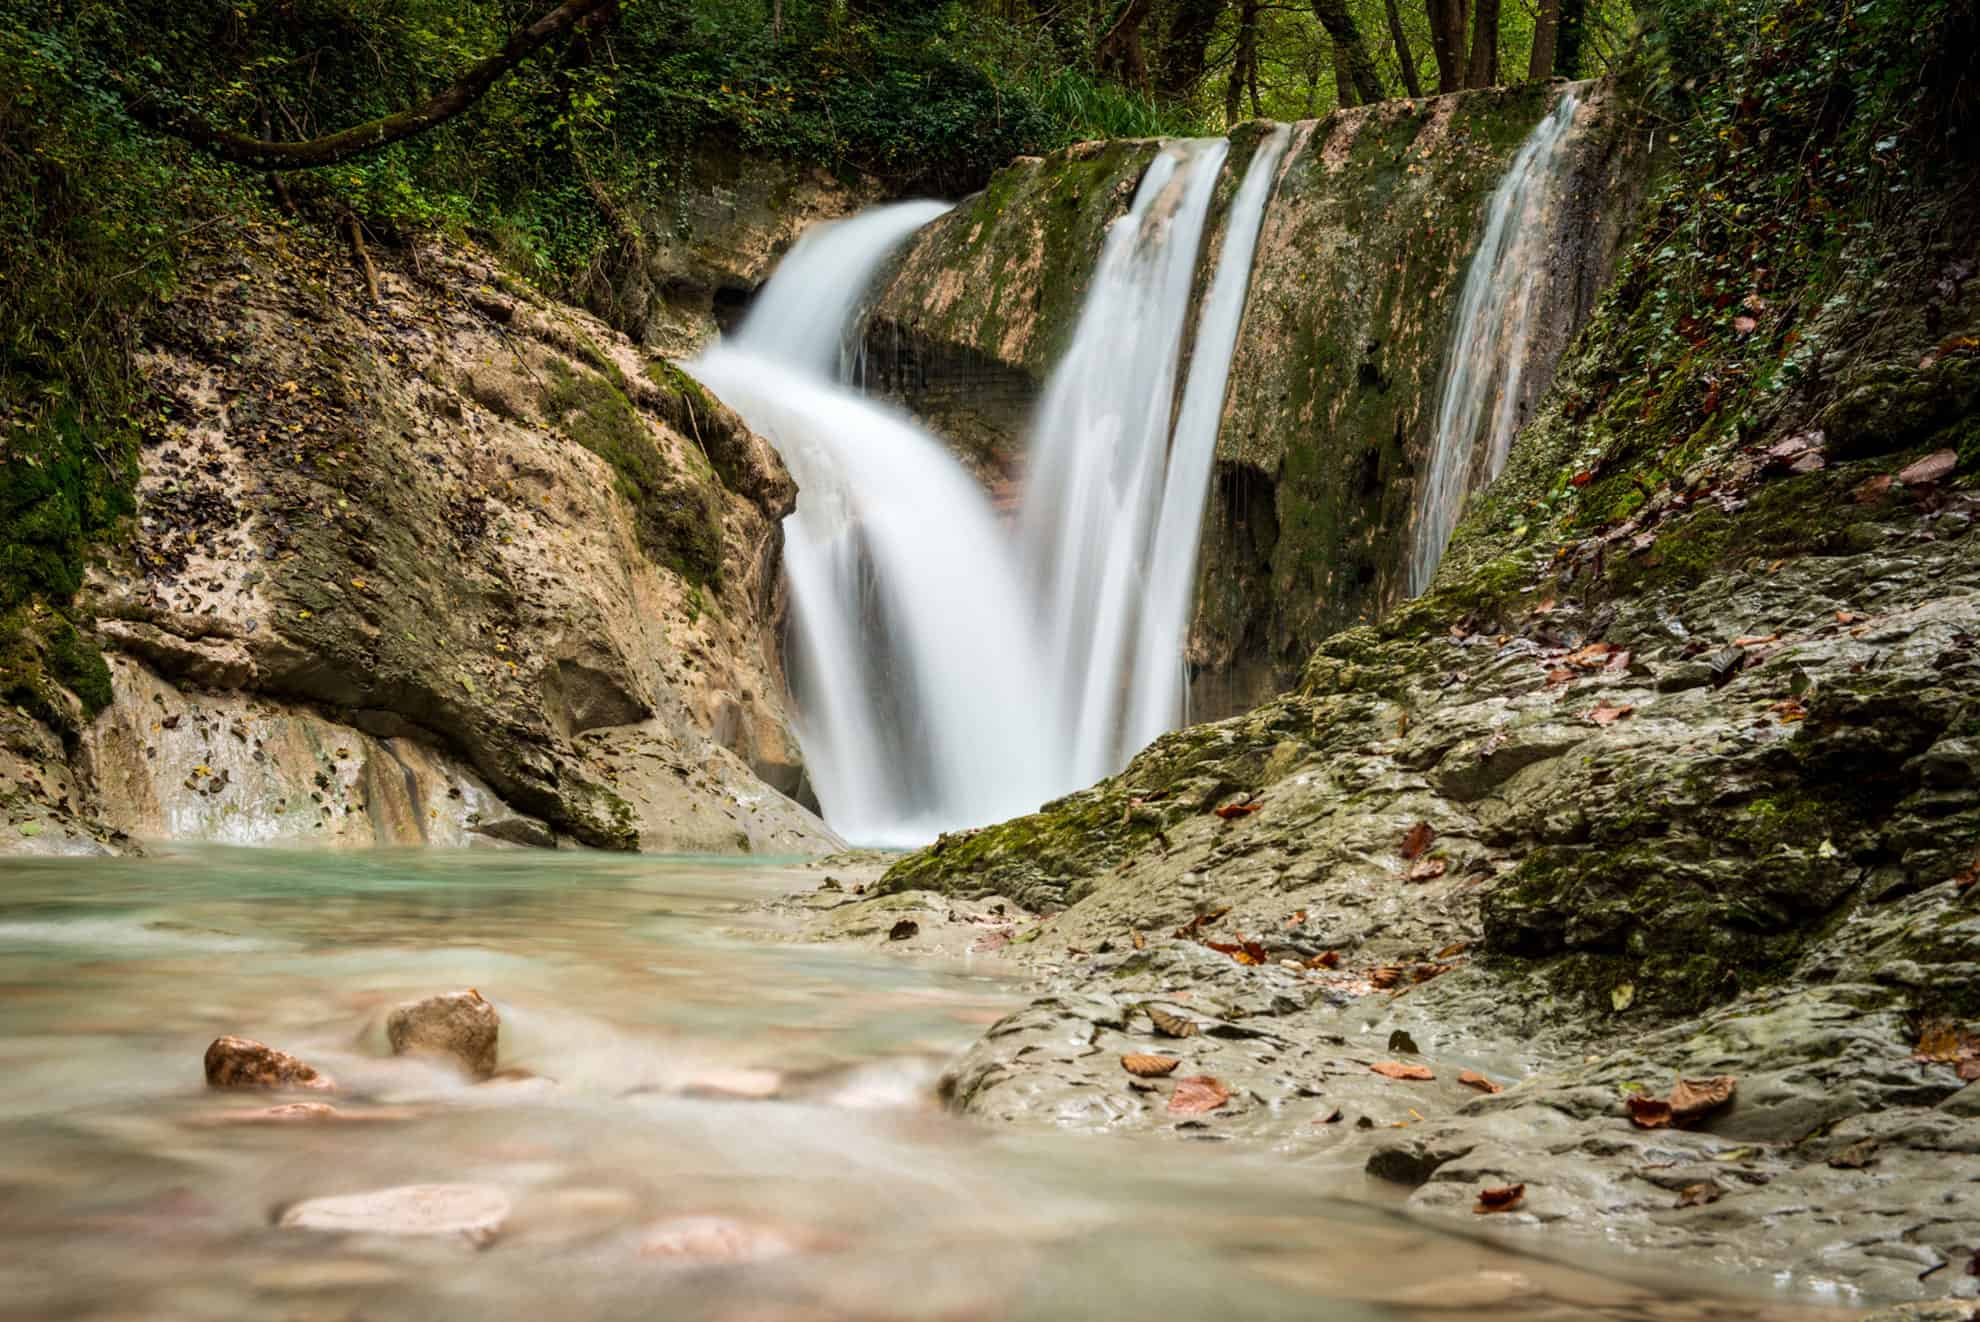 Cascatelle di Sarnano - Foto di Luca Tambella